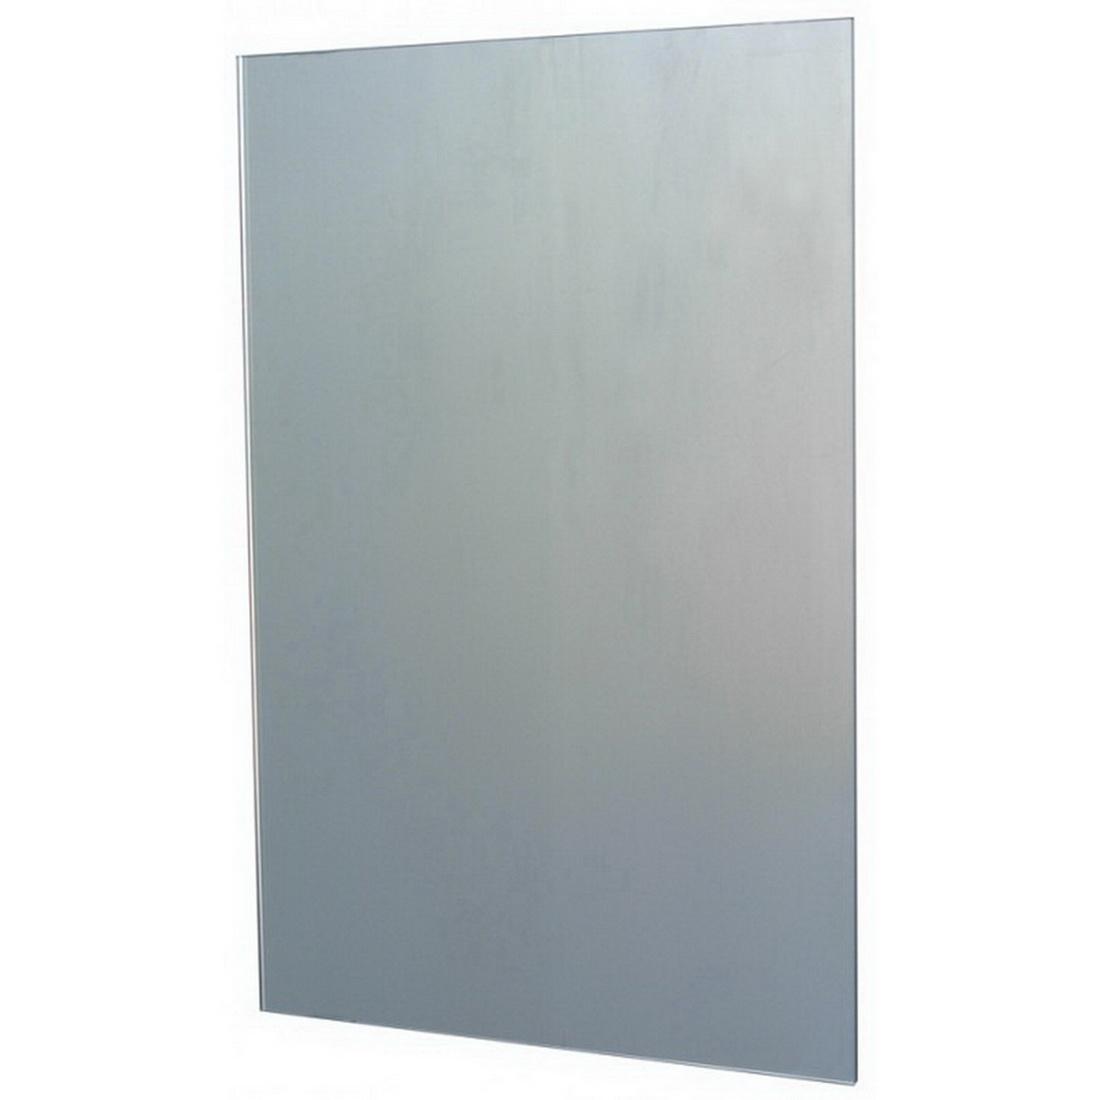 Styline Polished Edge Mirror 750 x 600mm 75X6STYLE